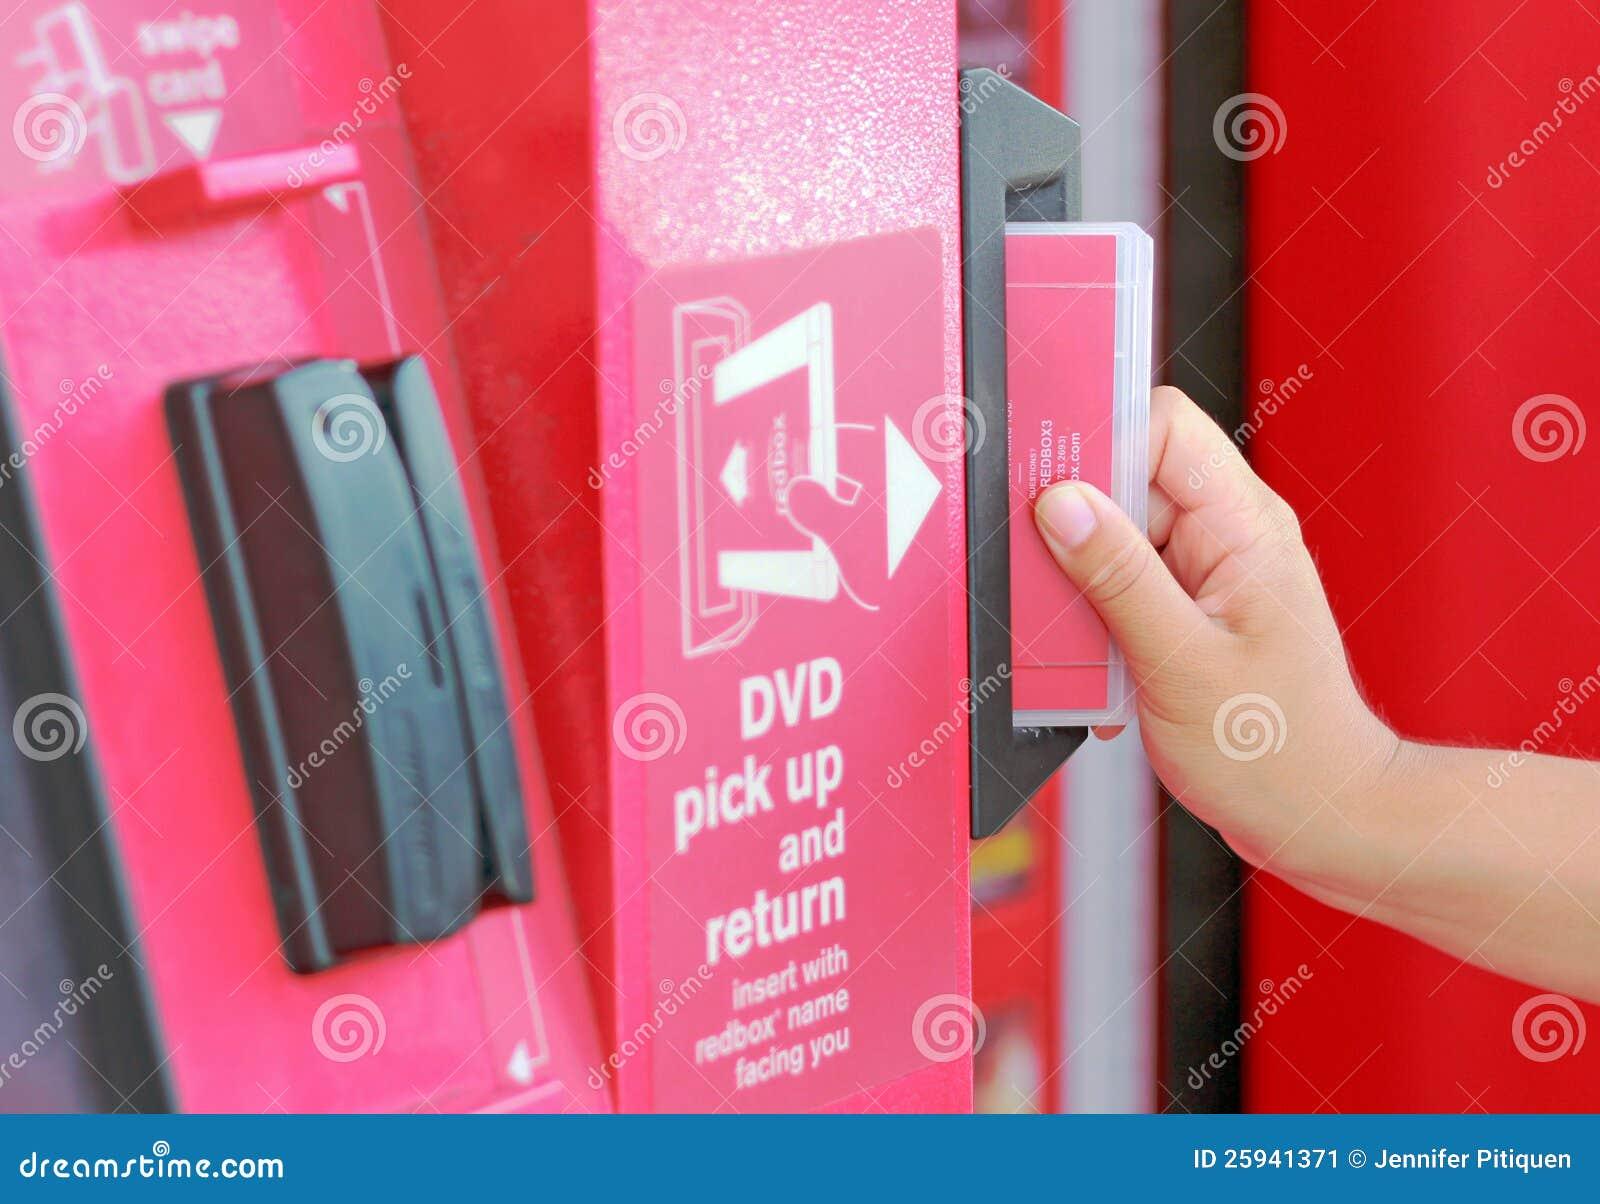 Redbox deposit slot editorial photo image 25941371